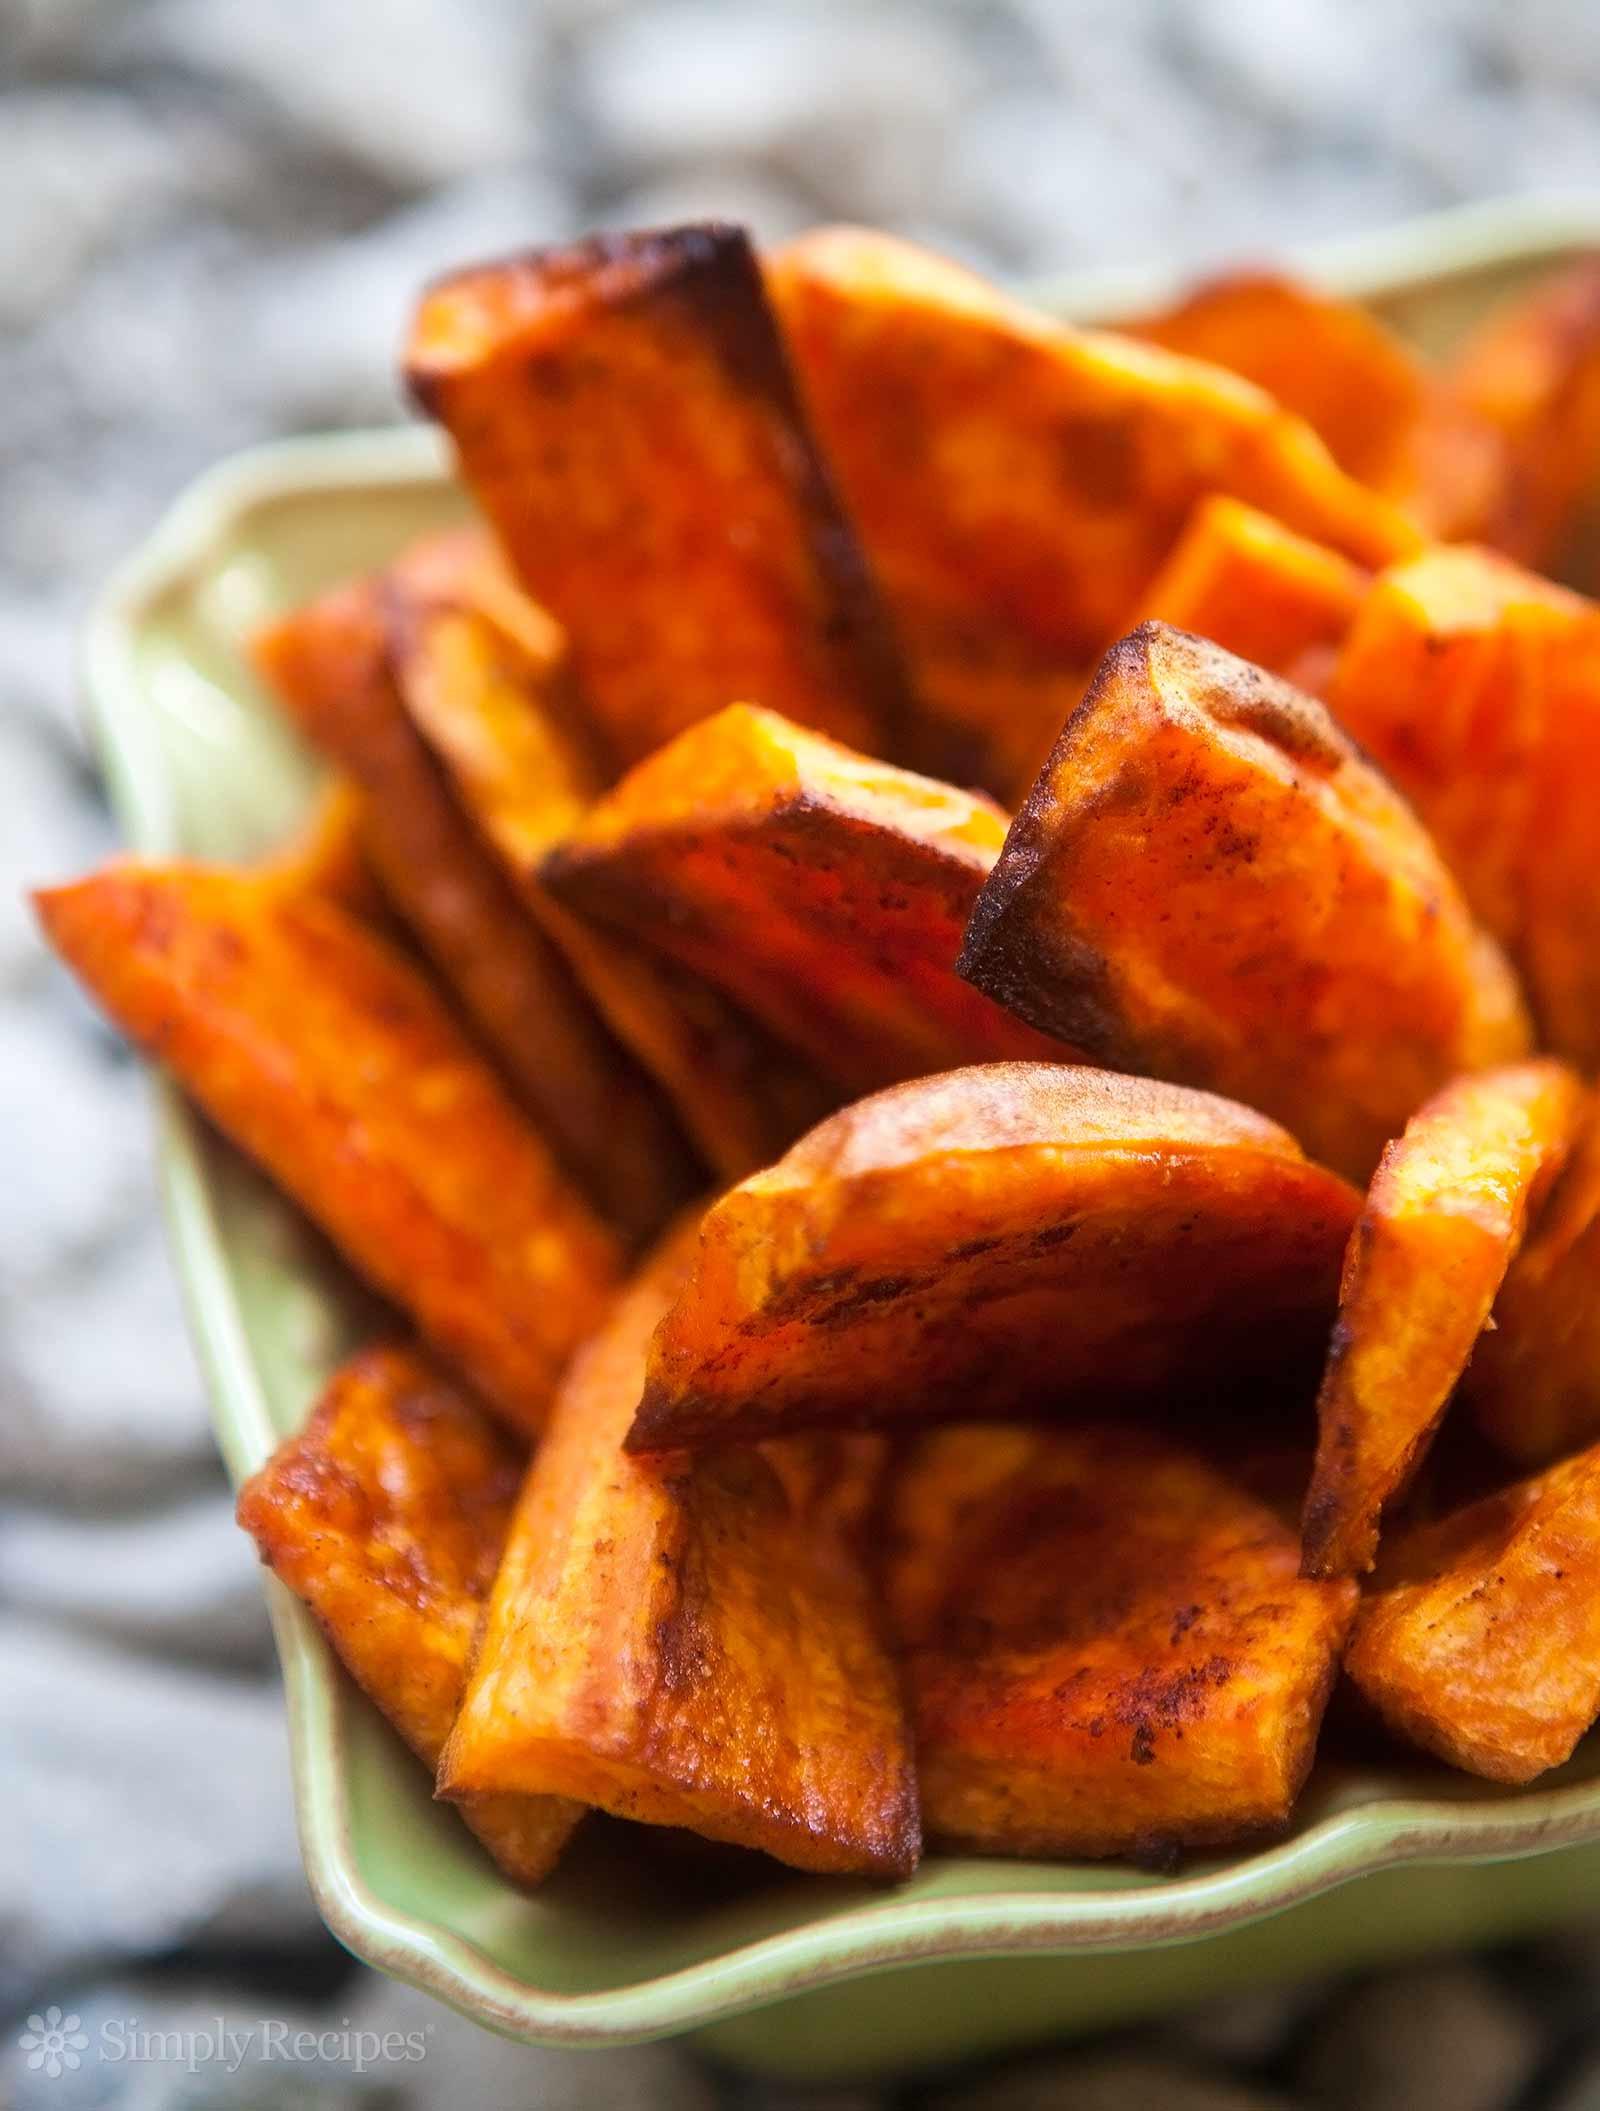 Boil Sweet Potato Recipes  Oven Baked Sweet Potato Fries Recipe